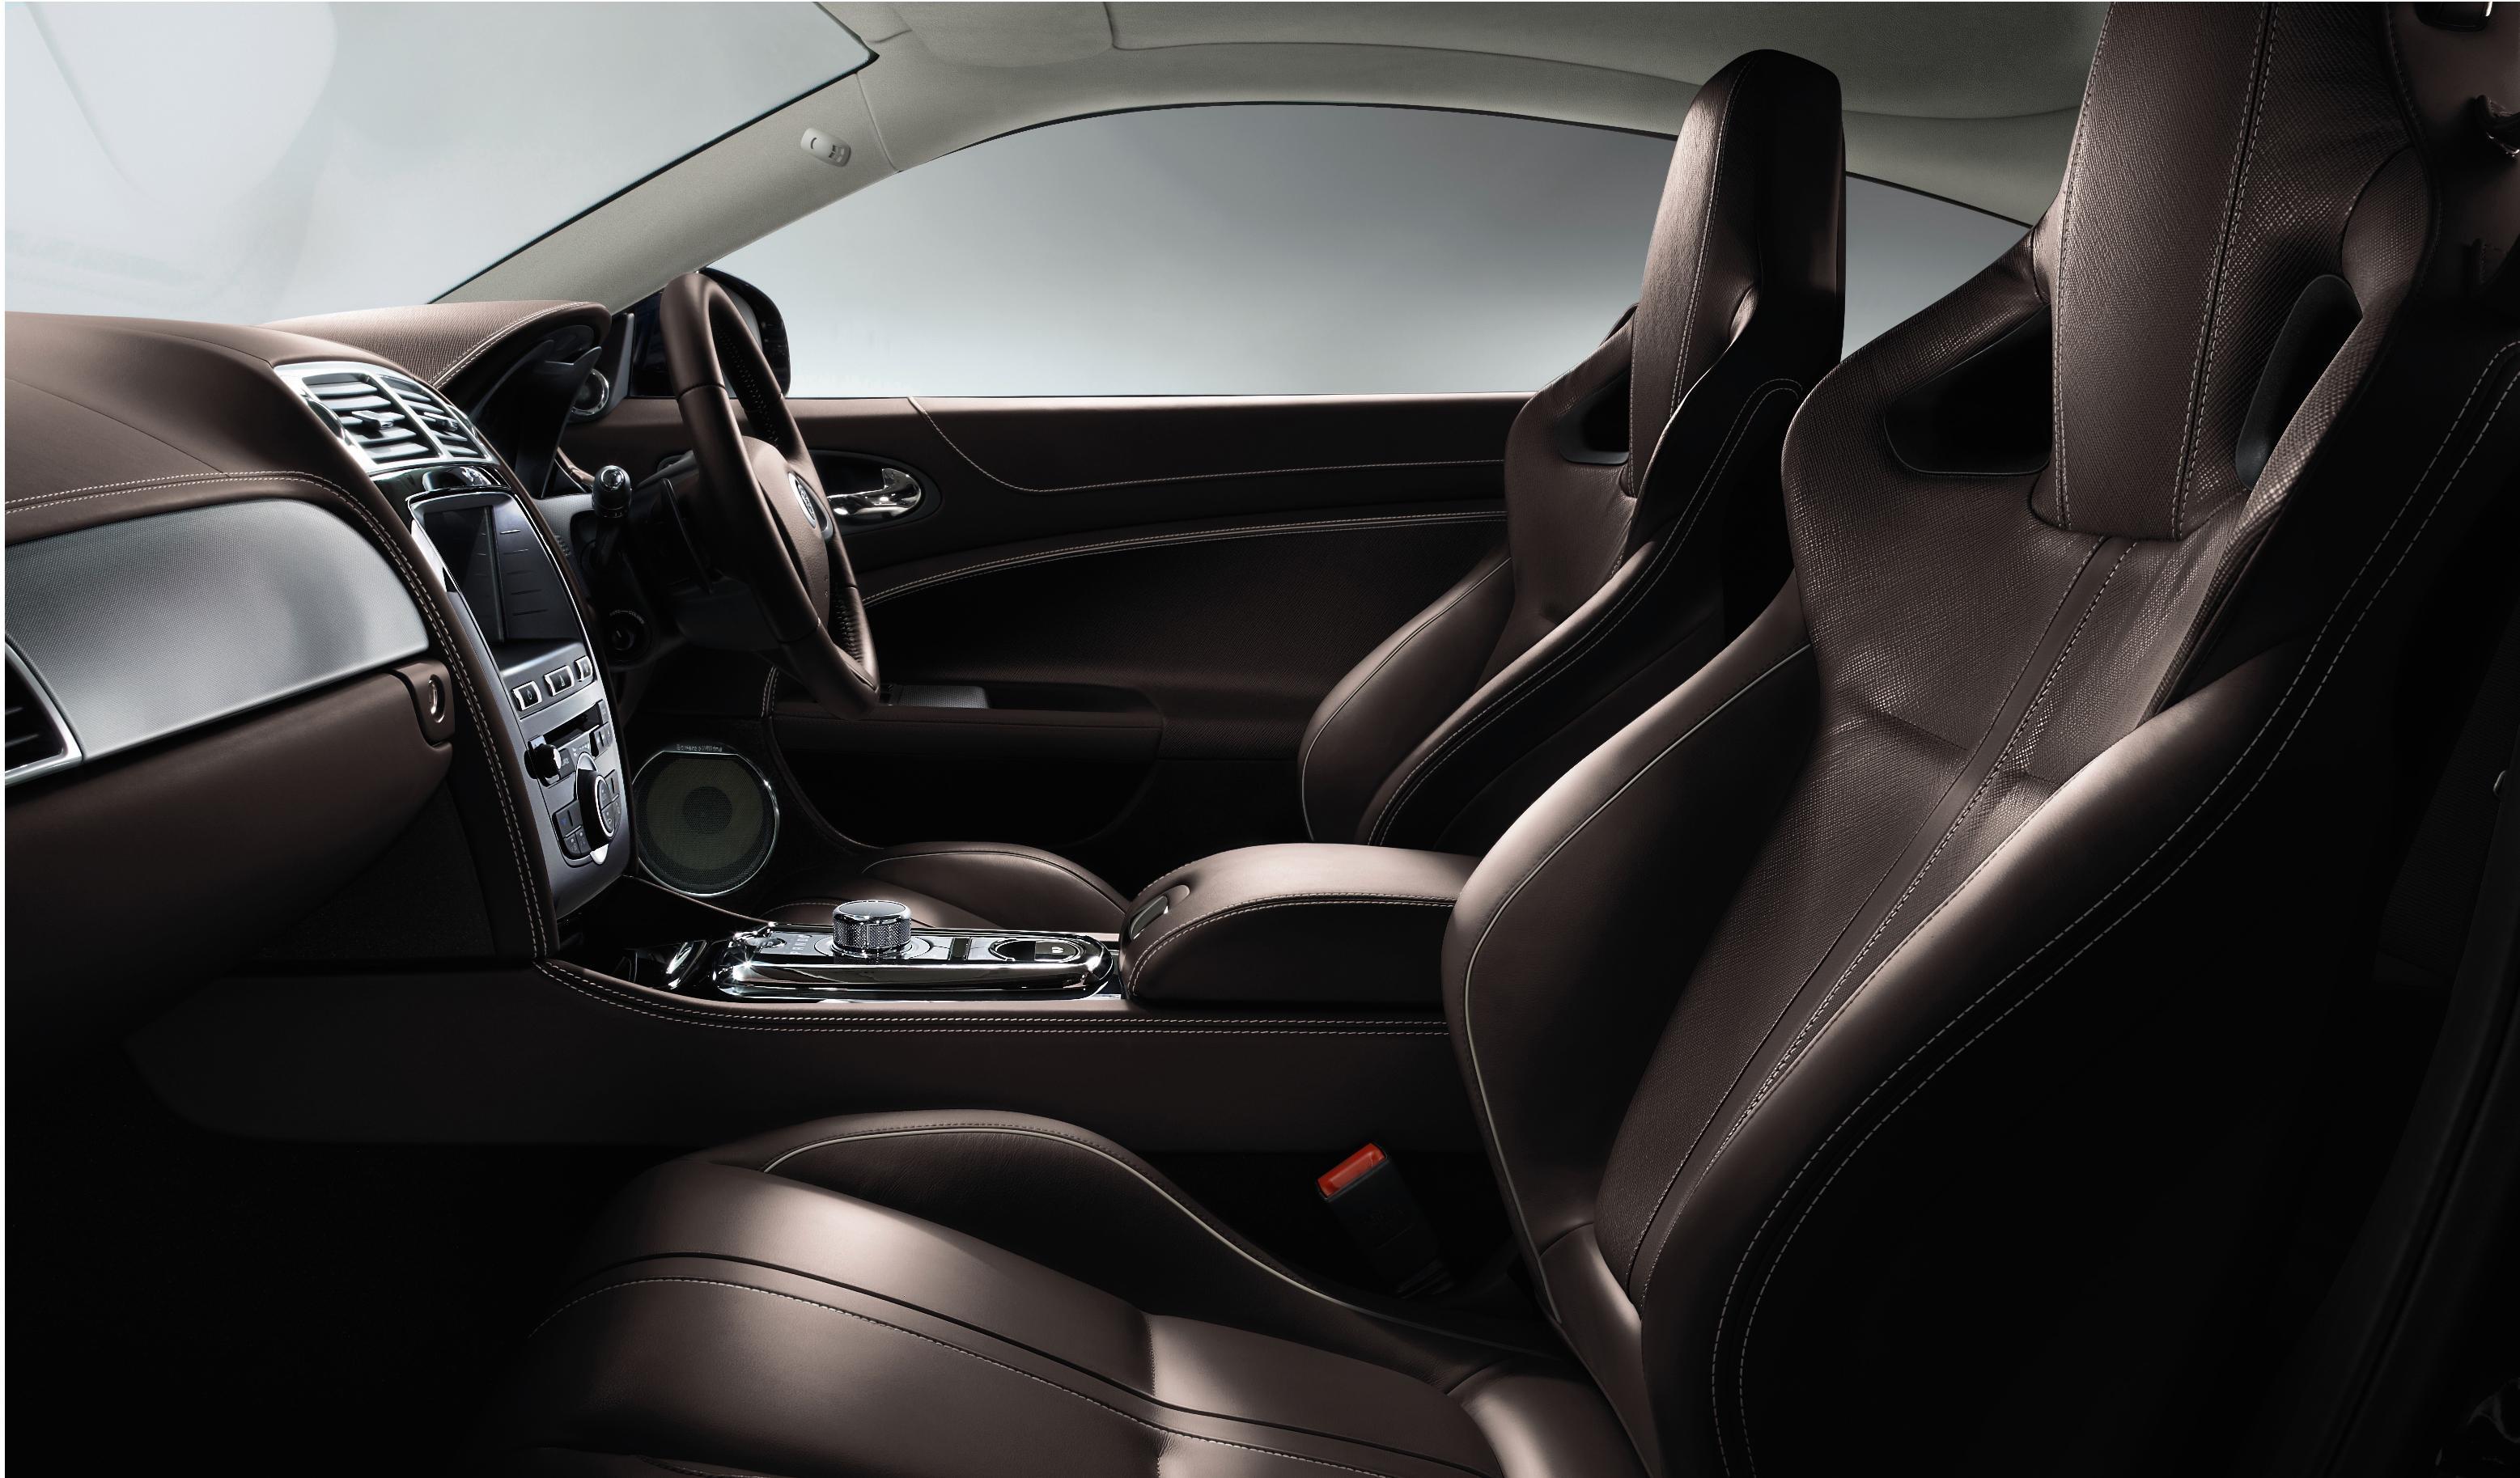 Jaguar XK Artisan SE 4